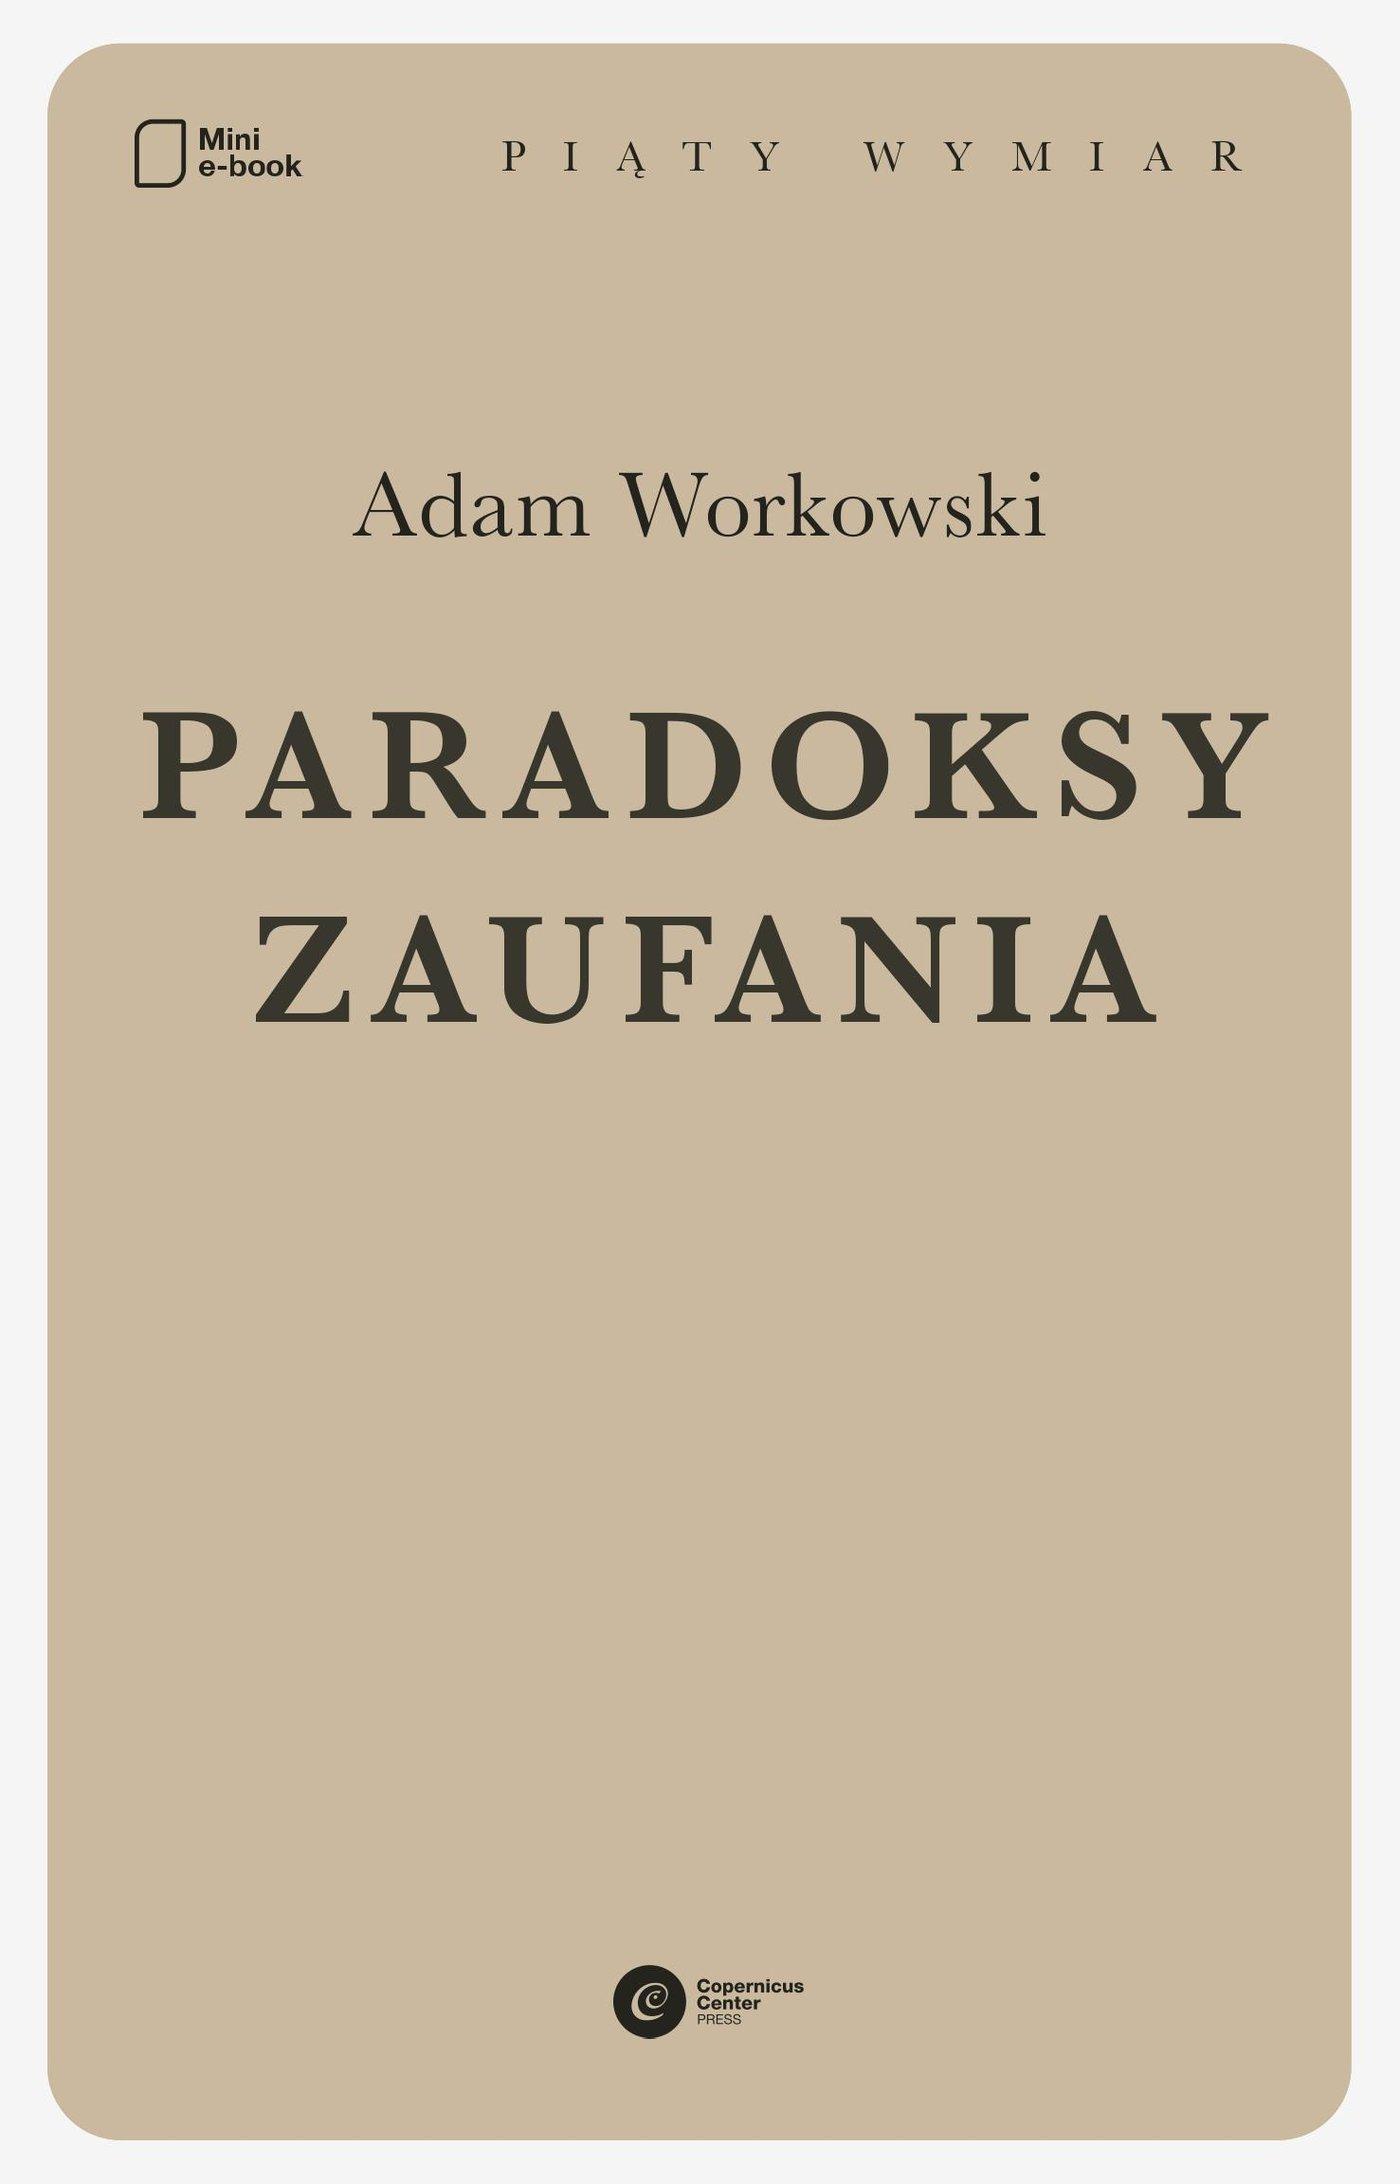 Paradoksy zaufania - Ebook (Książka EPUB) do pobrania w formacie EPUB